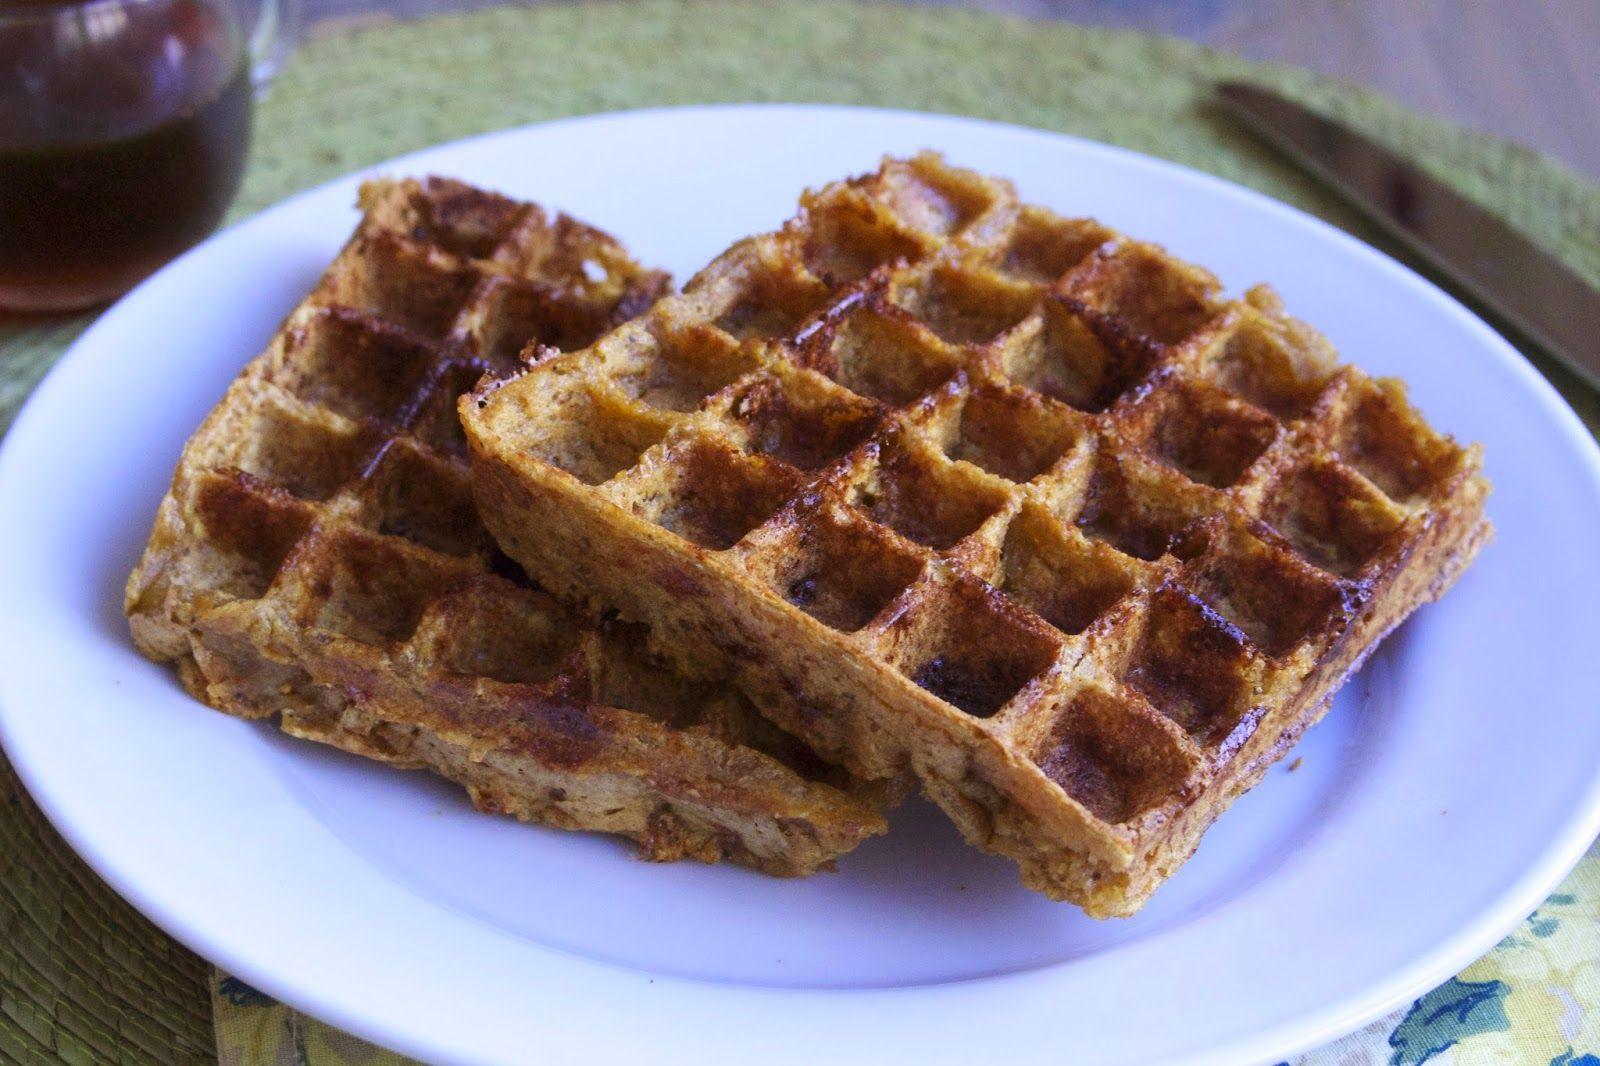 AIP Friendly Cinnamon Apple Plantain Waffles via http://beyondthebite4life.blogspot.com/2015/01/paleo-apple-cinnamon-waffles-aip.html #paleo #primal #aip